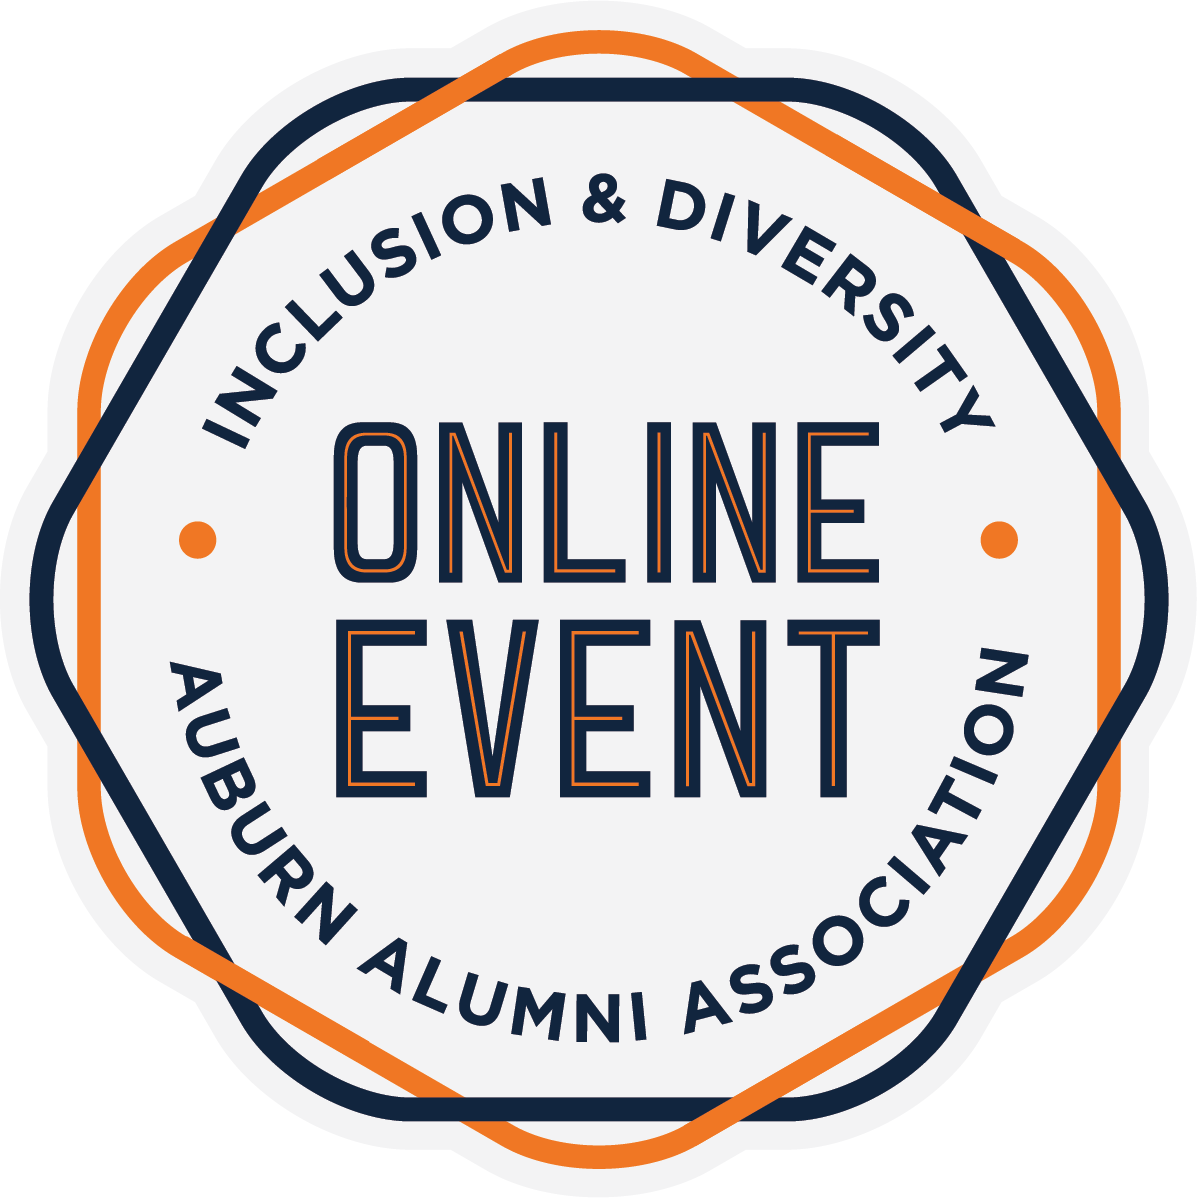 ID-online-event-badge